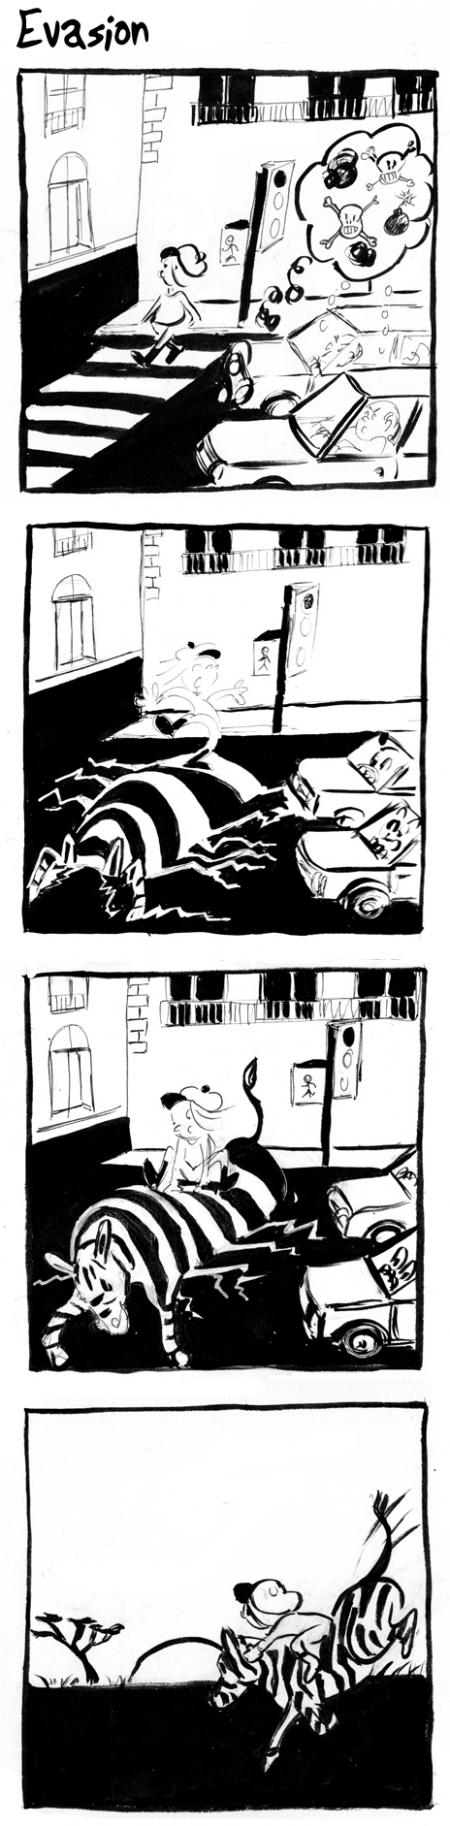 webzine,bd,gratuit,zébra,bande-dessinée,fanzine,strip,lola,aurélie dekeyser,zébra,évasion,passage piétons,carrefour